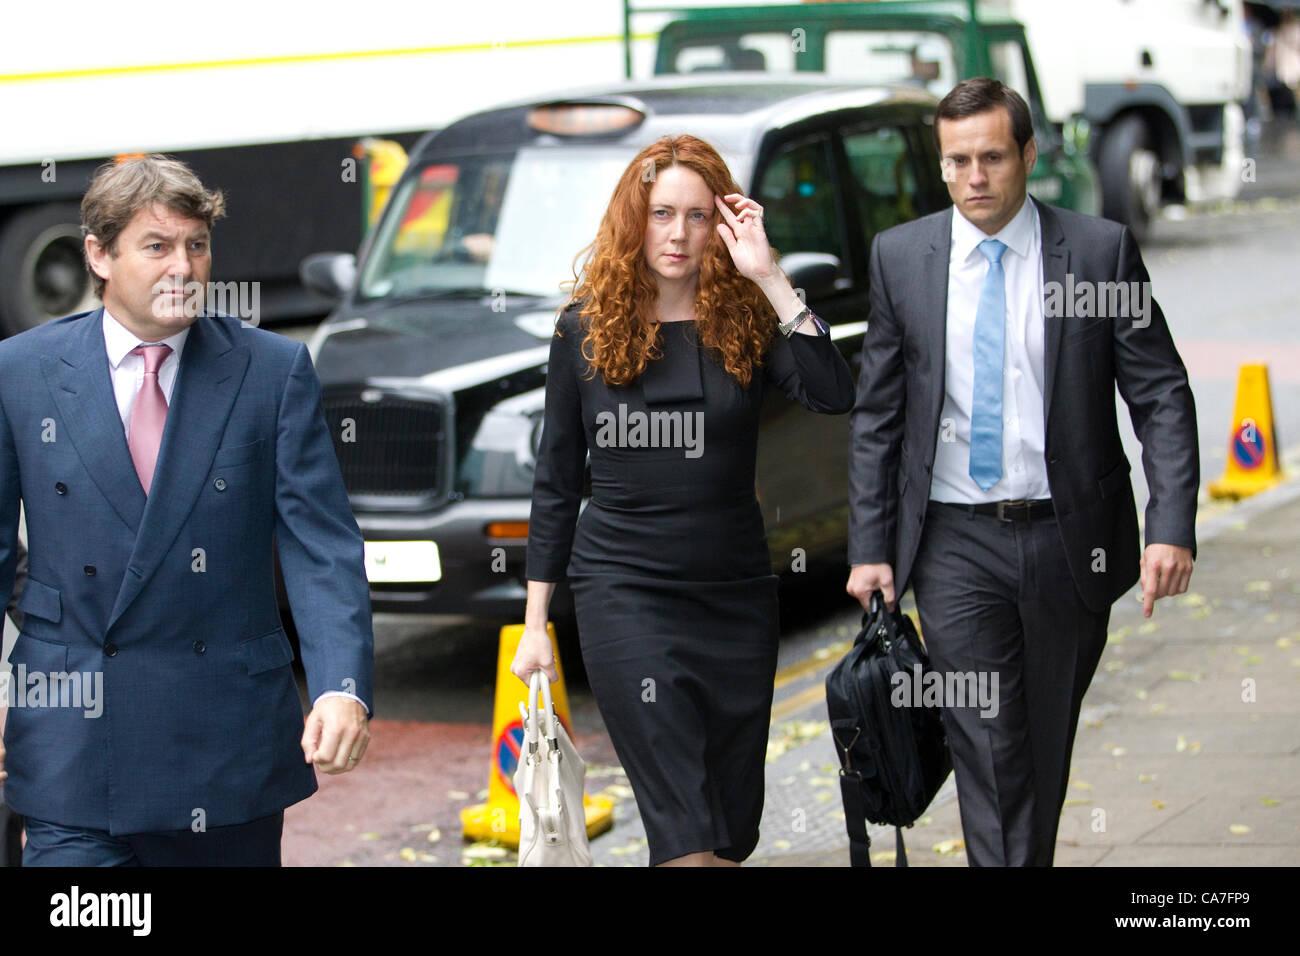 Southwark Crown Court, London, UK. 22.06.2012 Rebekah Brooks  with husband (left) Charlie arriving today at Southwark - Stock Image